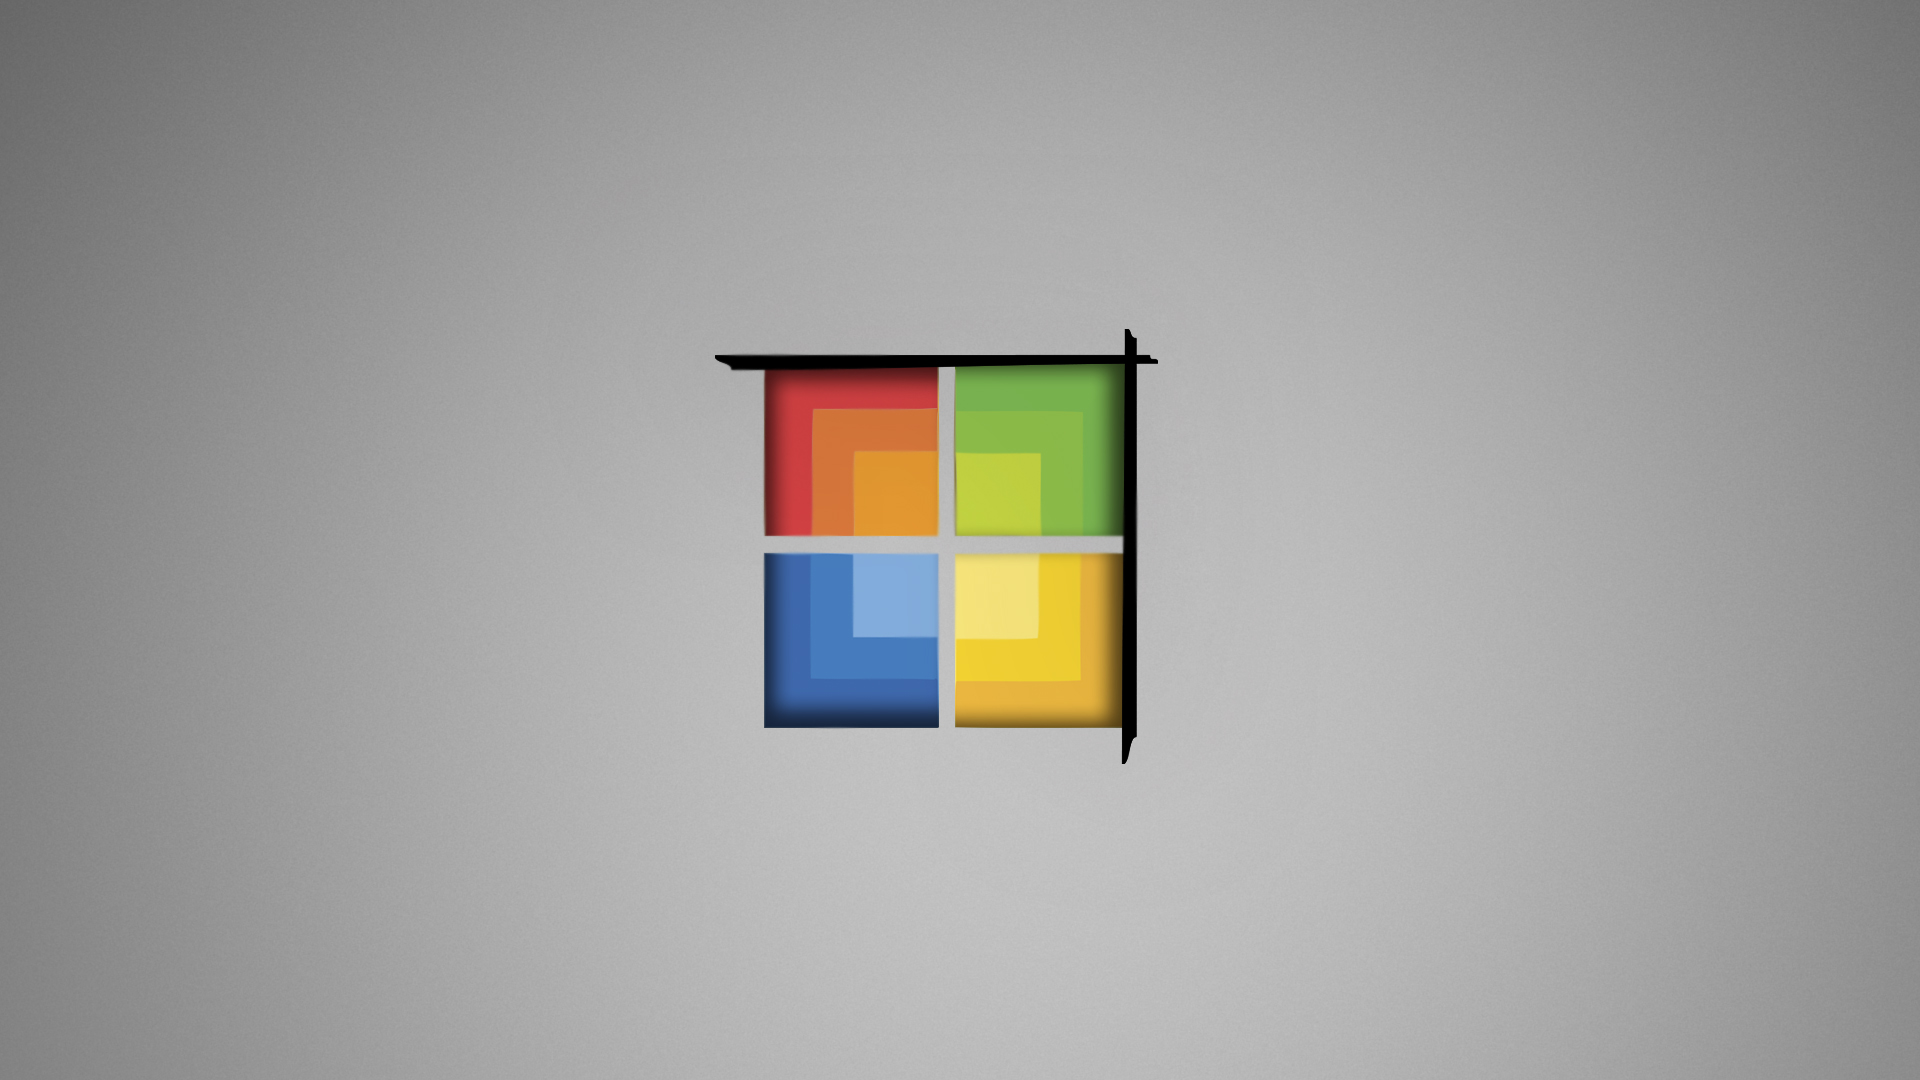 Retro Windows Wallpaper By MrRomMaster On DeviantArt